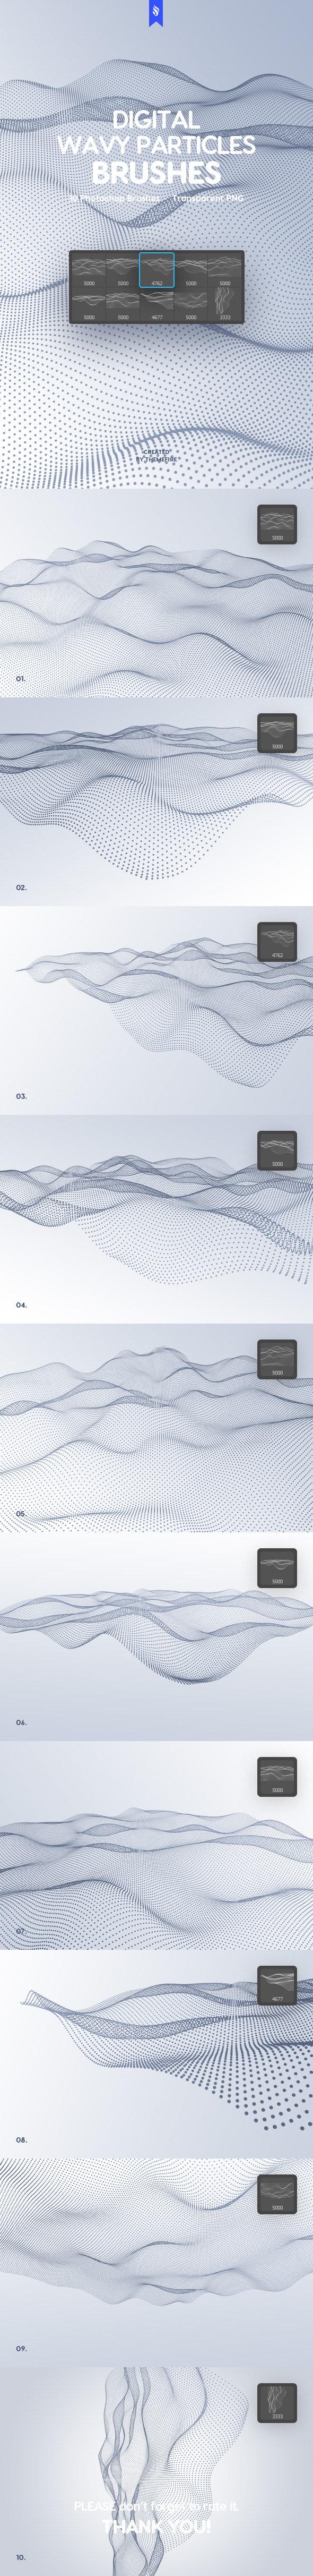 Digital Wavy Particles Photoshop Brushes - Techno / Futuristic Brushes